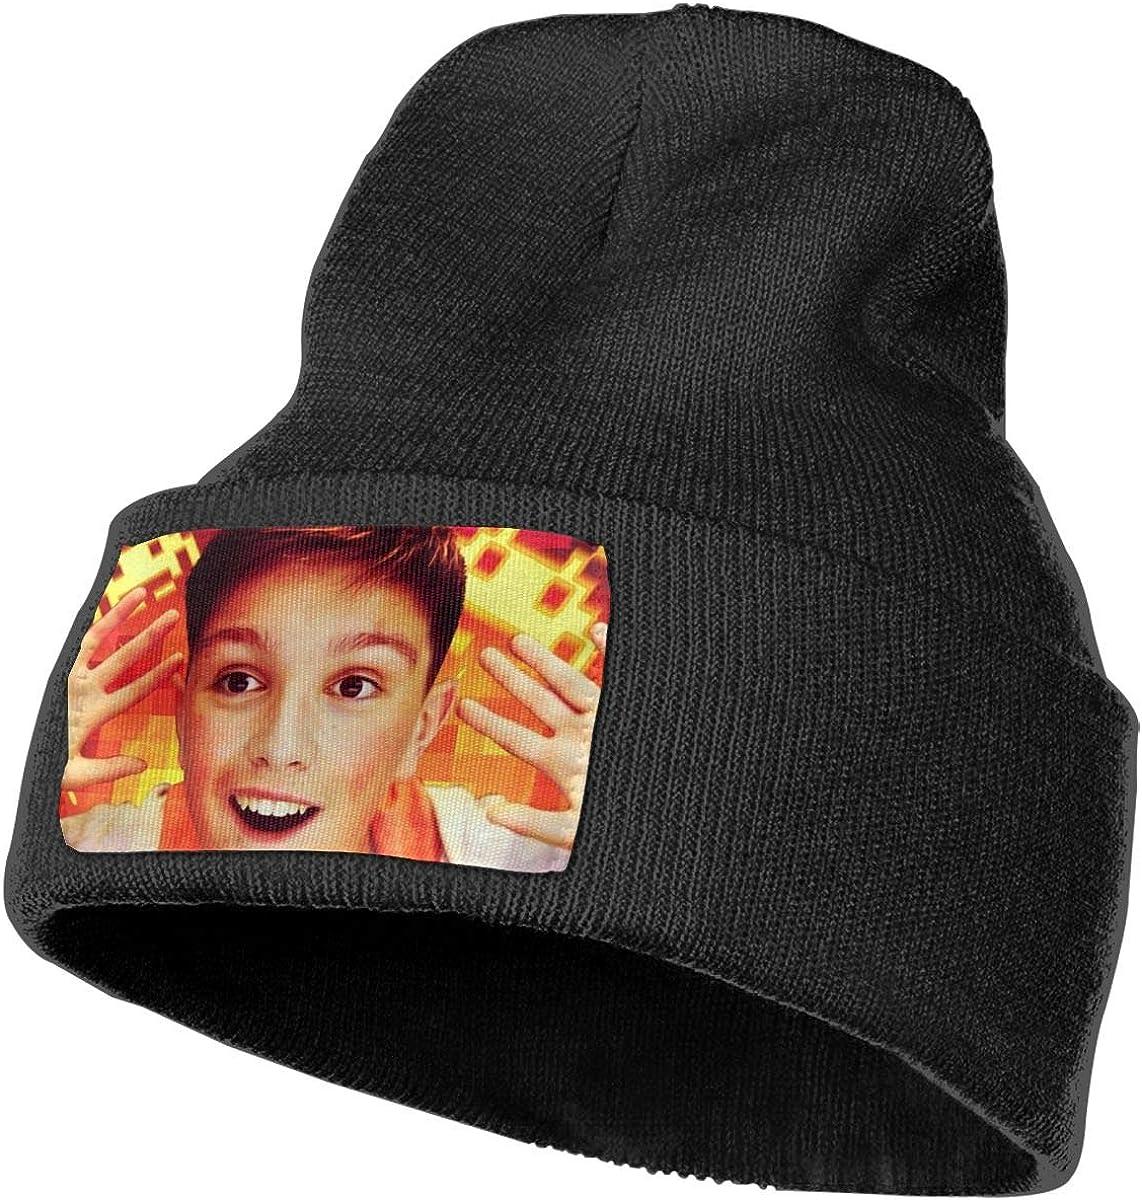 Morgz Challenge Classic Winter Warm Knit Hat Beanie Cap for Men Women